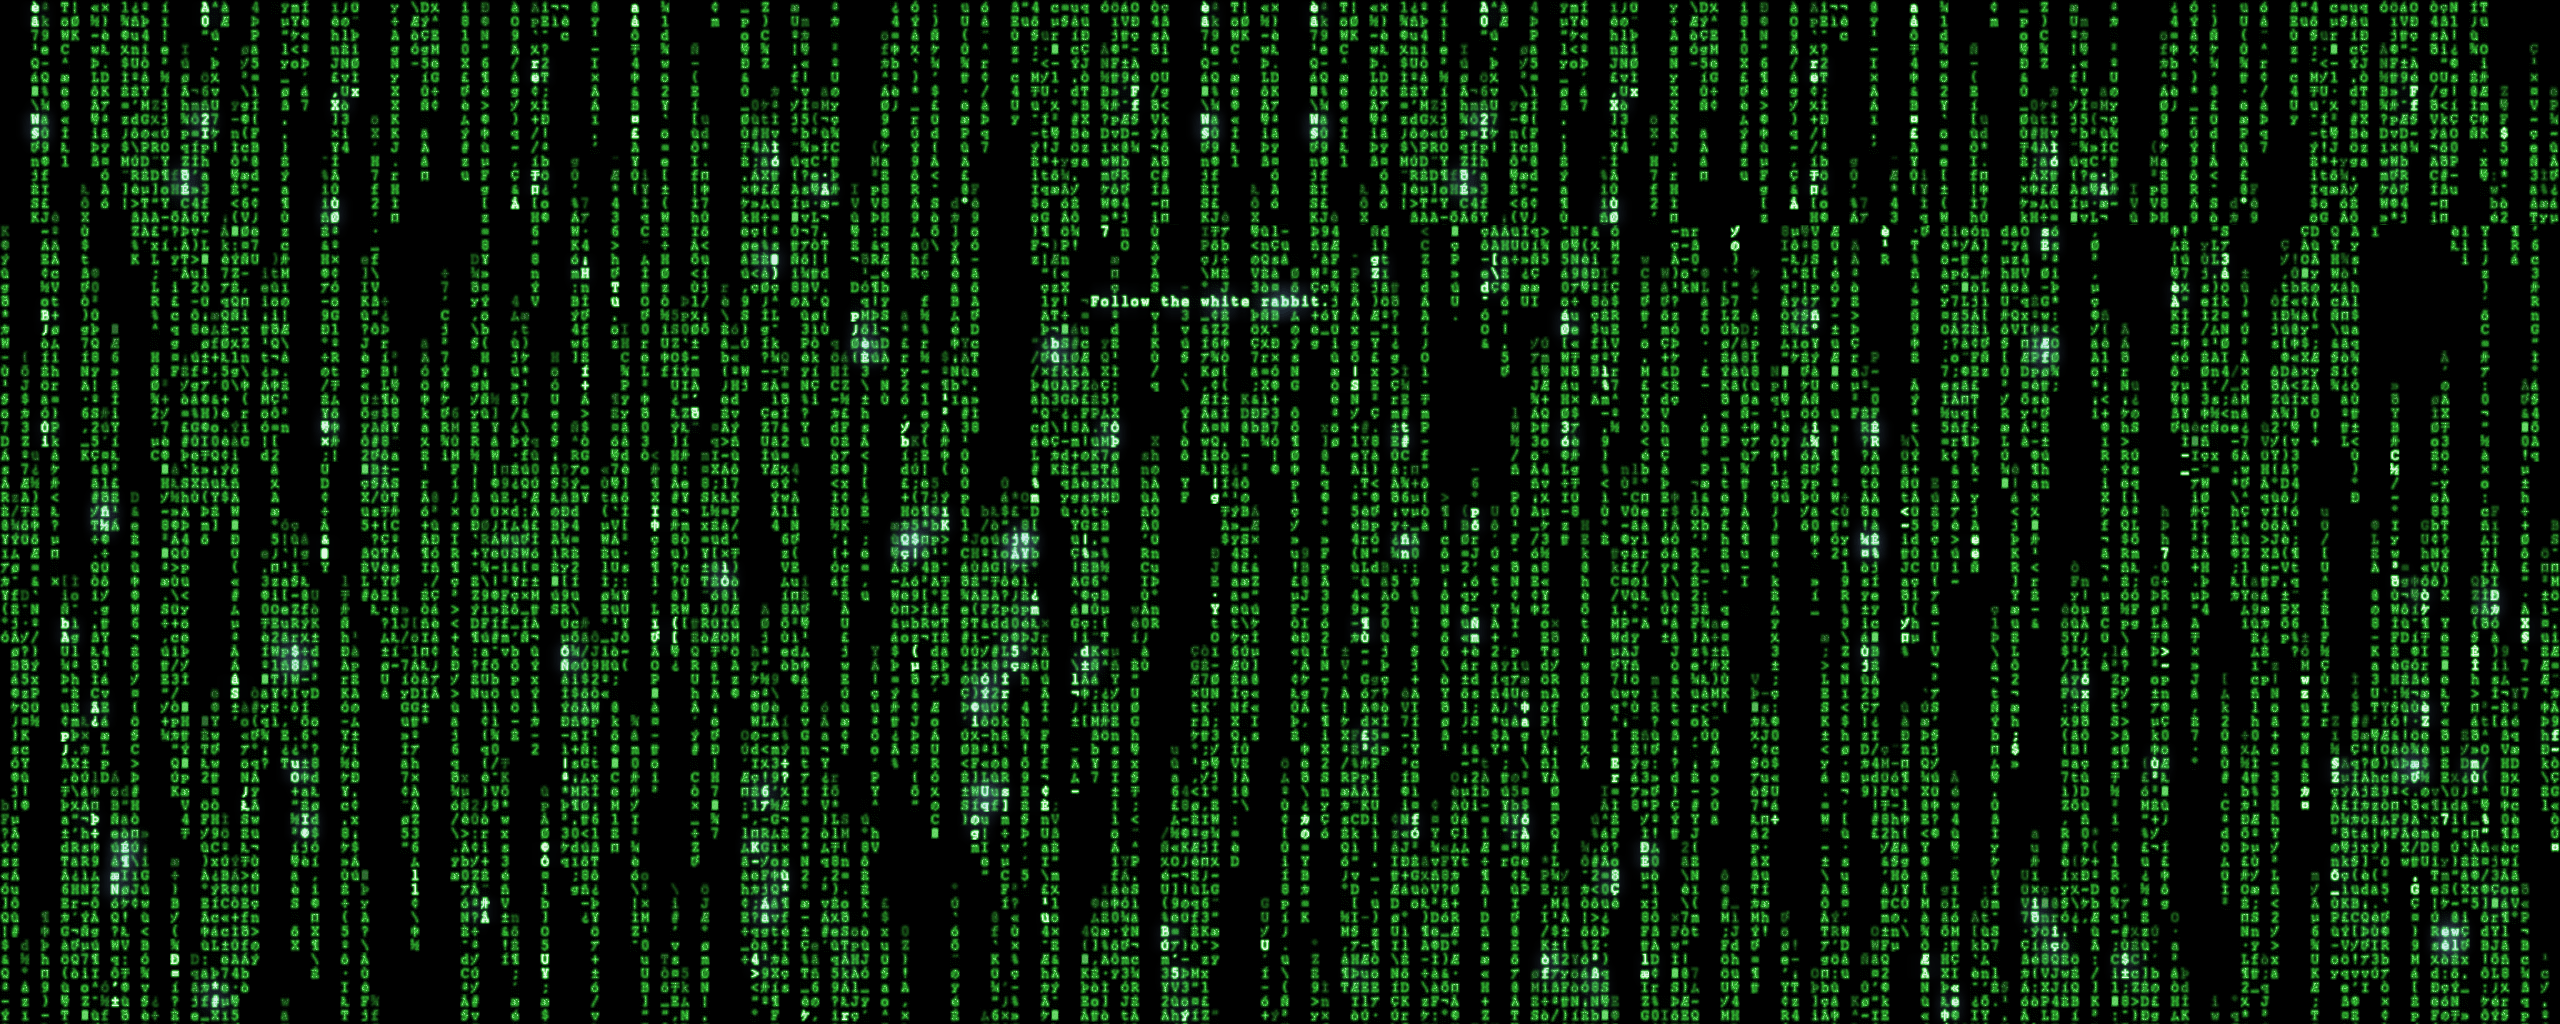 the matrix wallpapers hd wallpapers hd wallpapers